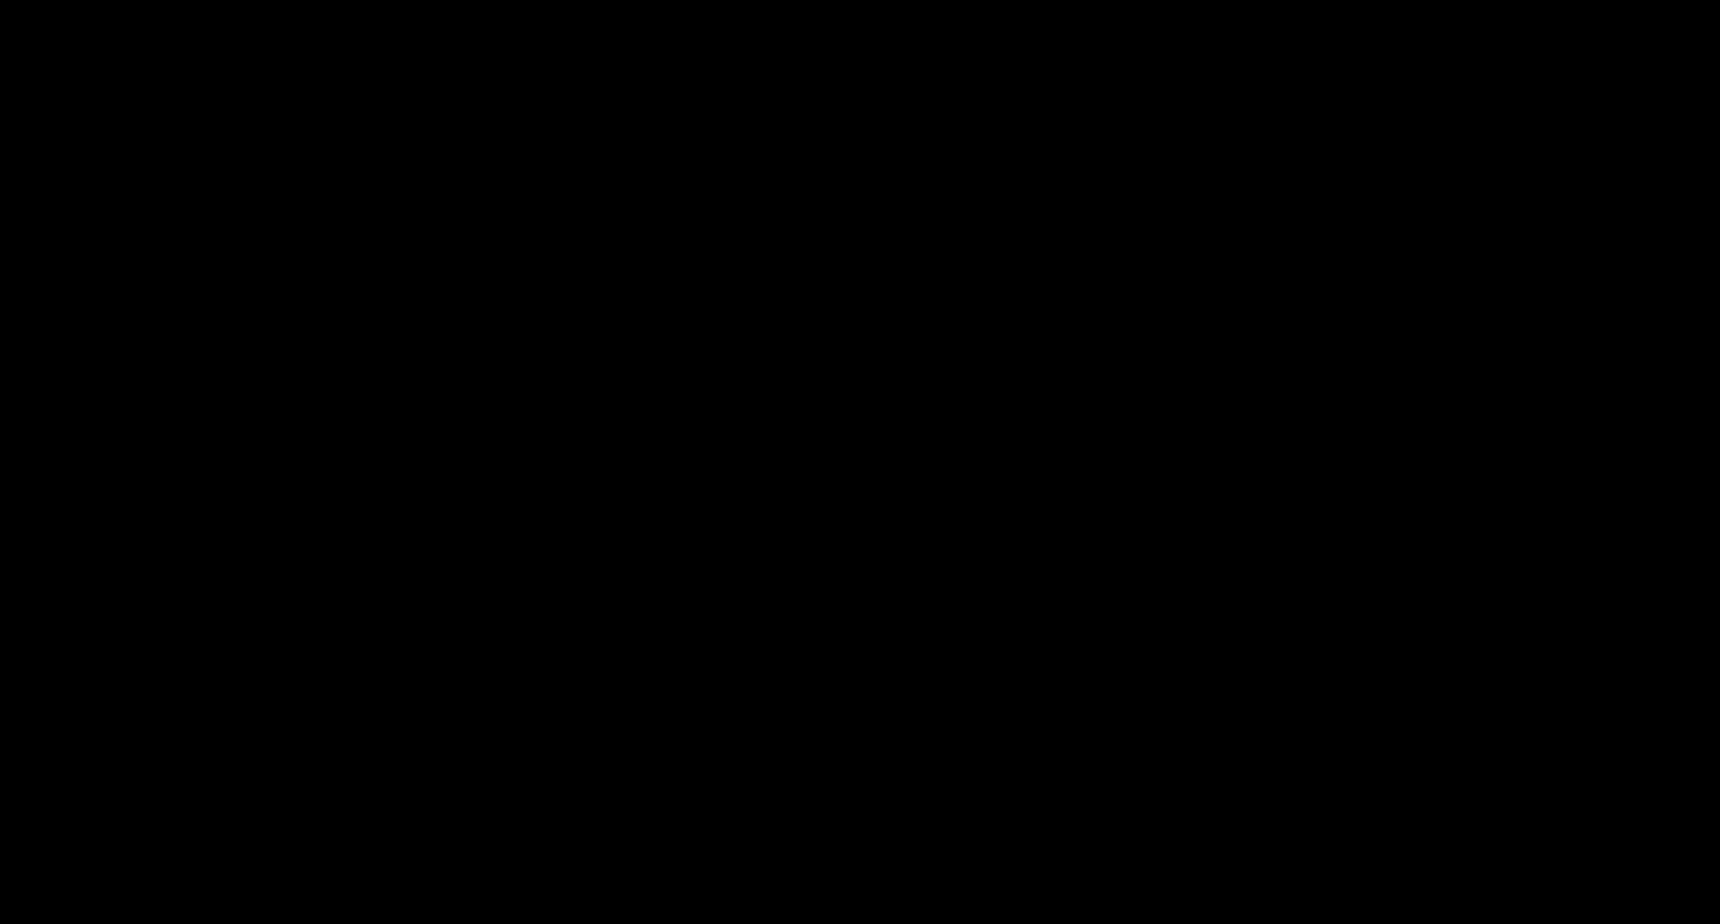 Dansyl-d<sub>6</sub> amidohexamethylamine